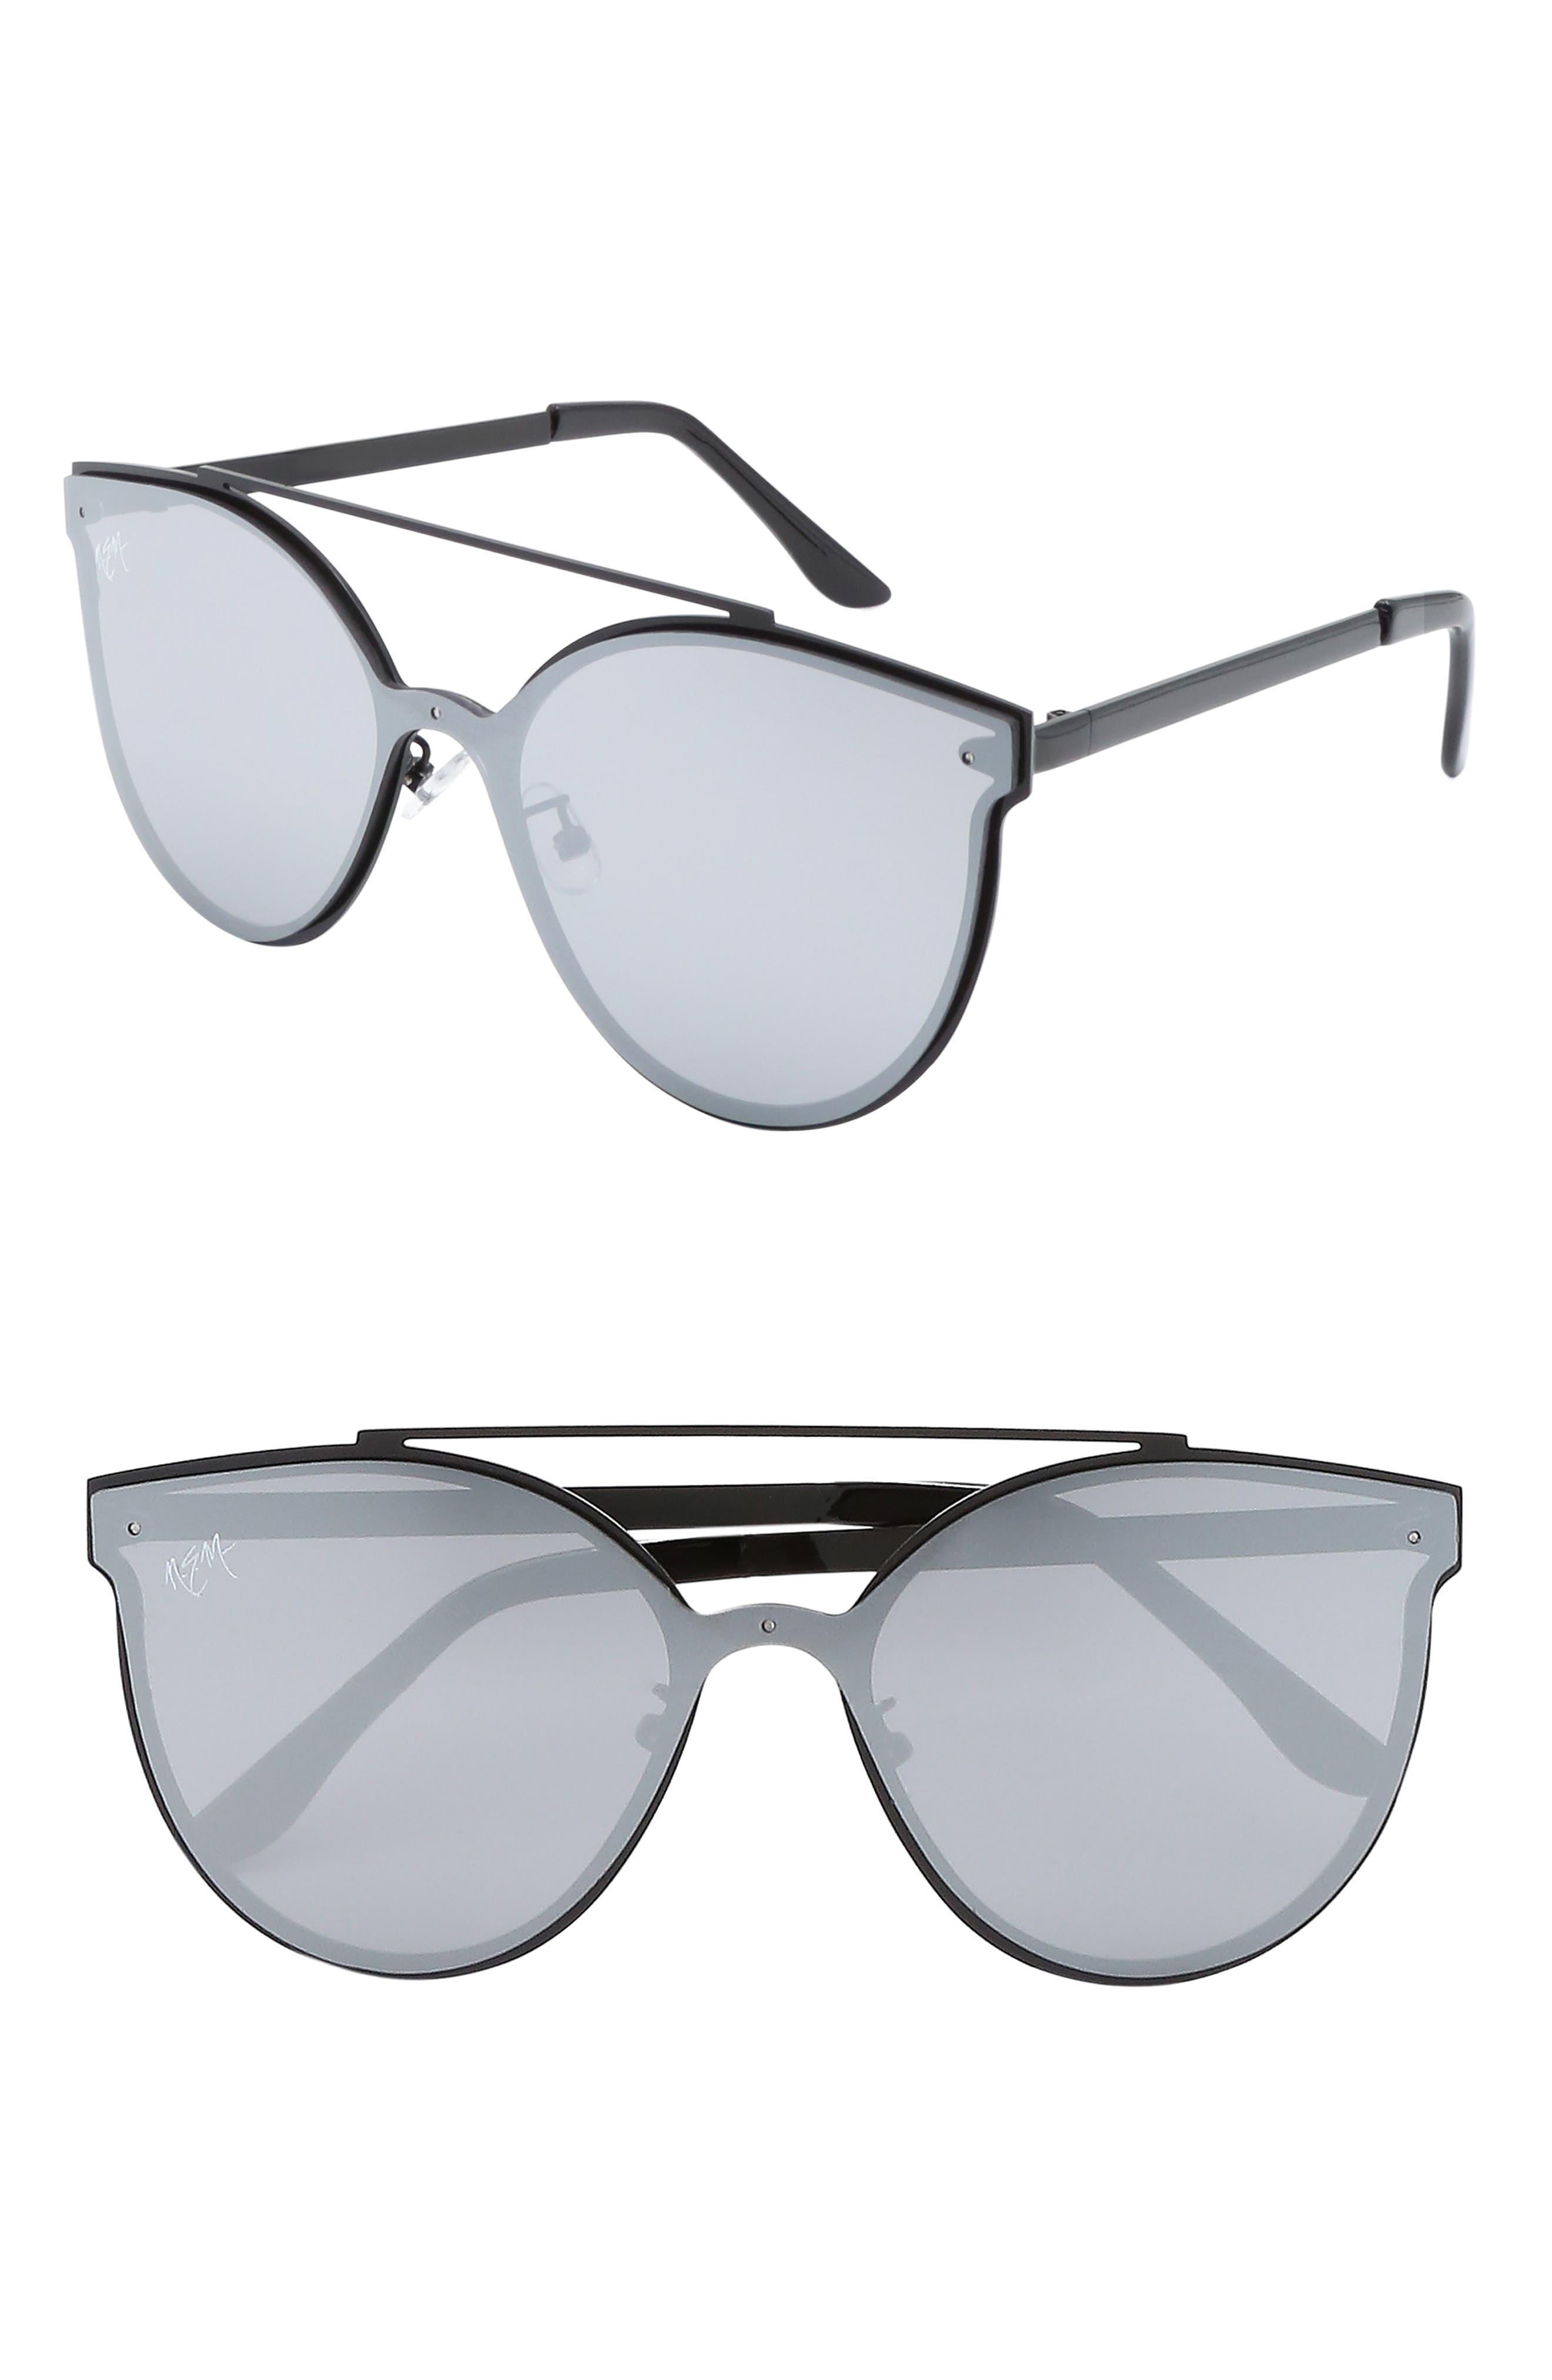 Nem Matisse 55Mm Cat Eye Sunglasses - Black W Grey Tinted Lens